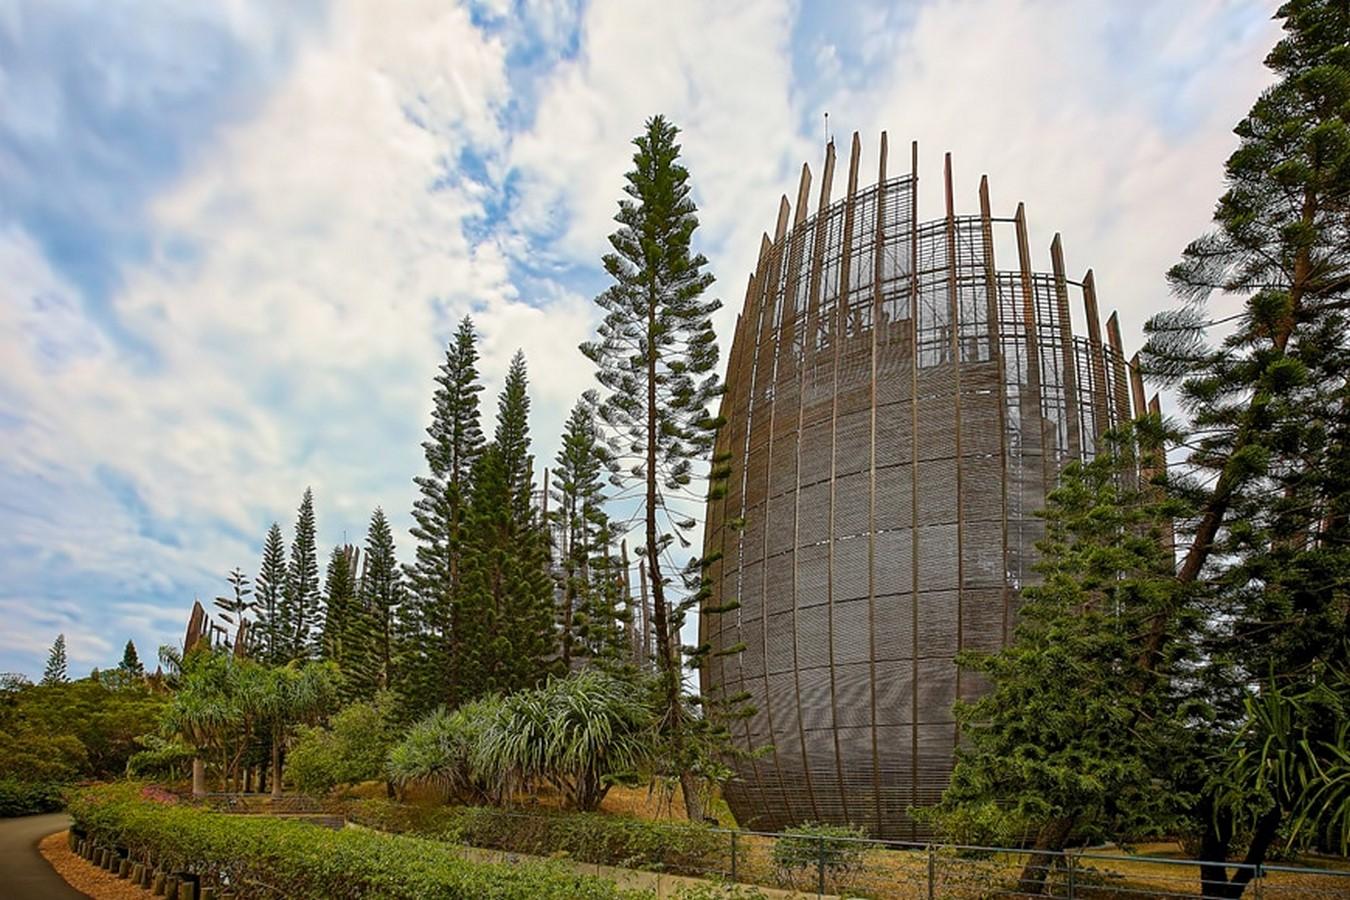 Jean-Marie Cultural Center by Renzo Piano: Symbolizing the Kanak civilization - sheet 9